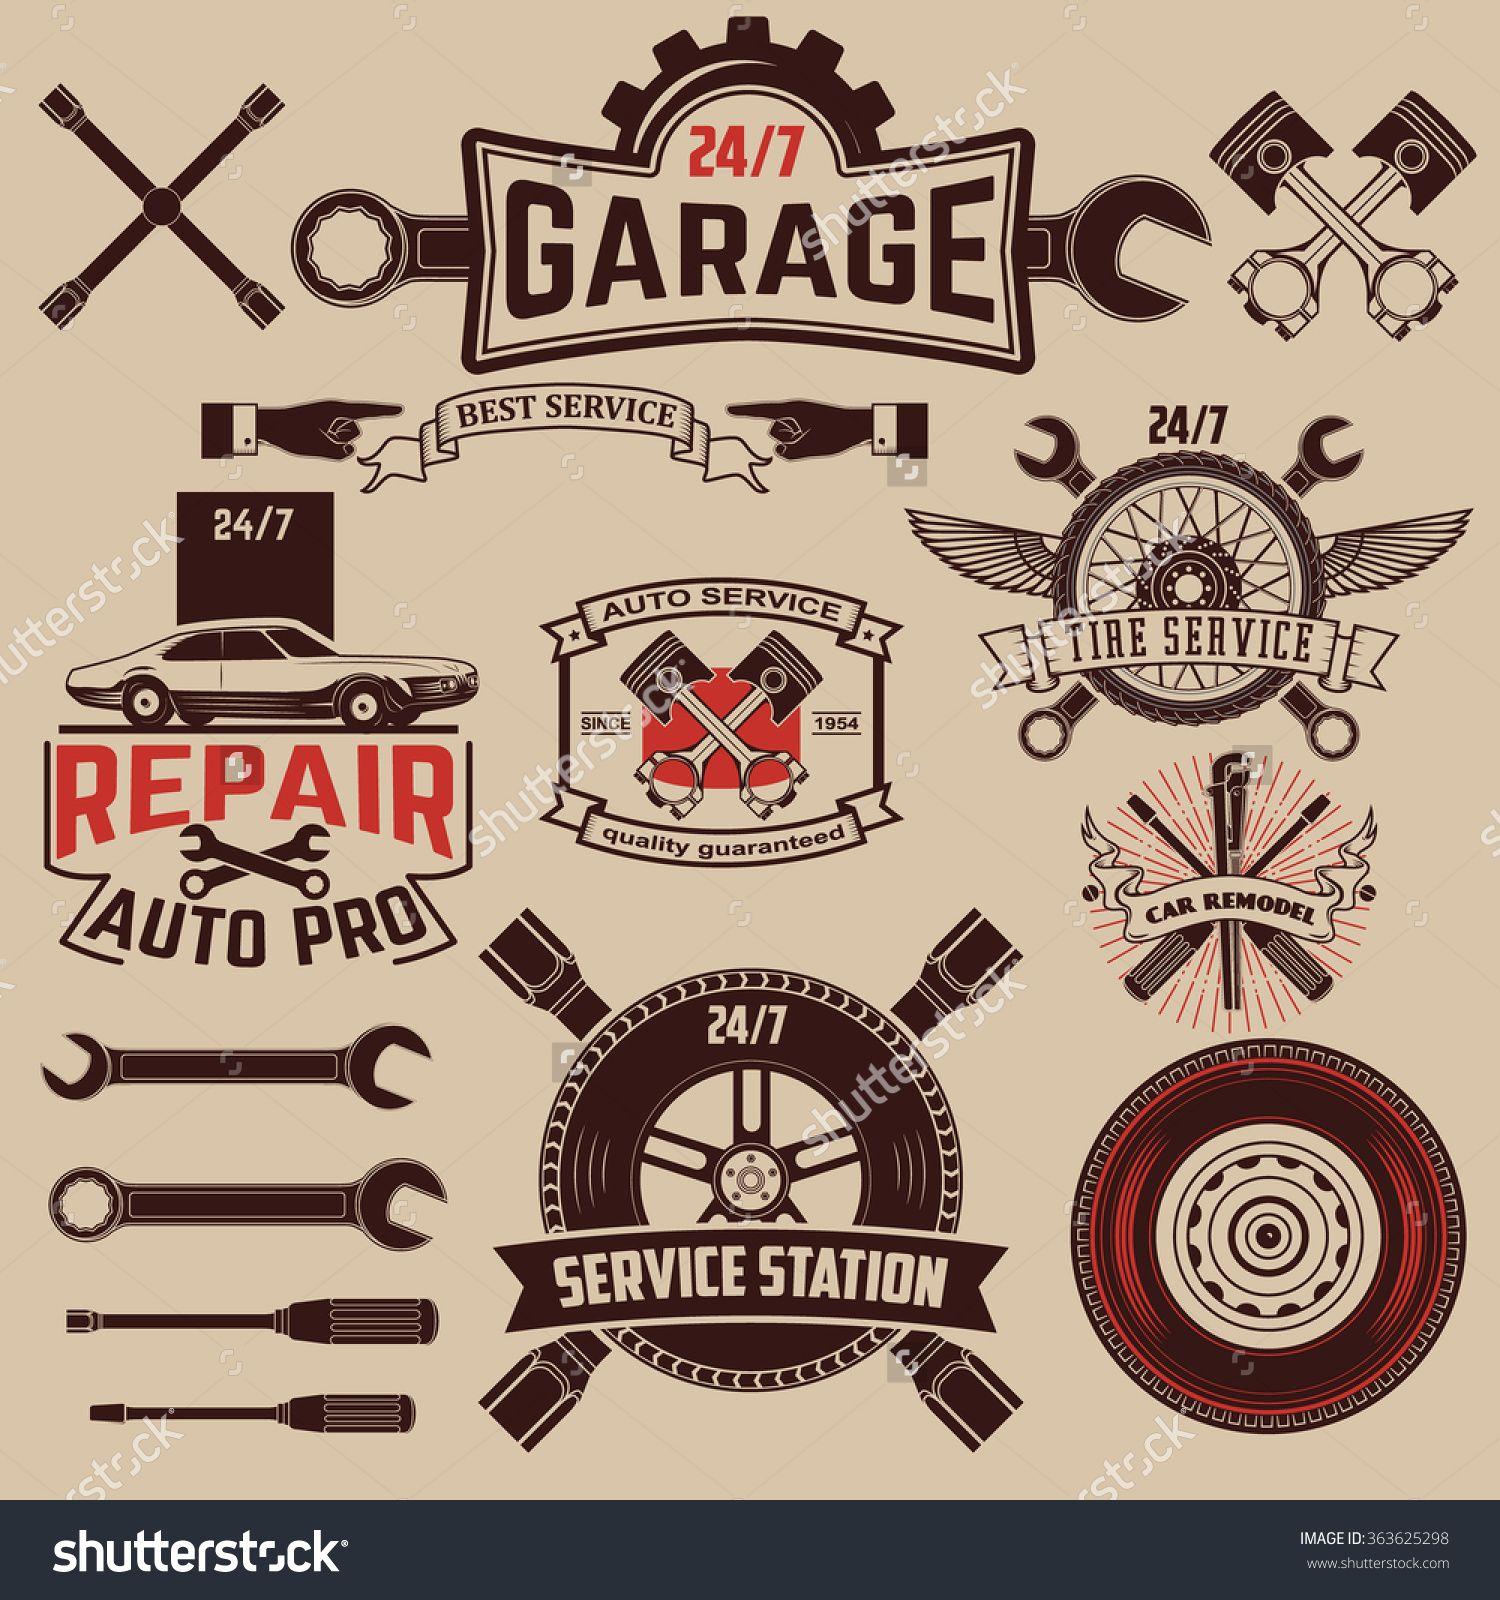 Stock-vector-set-of-car-service-icons-auto-parts-retro